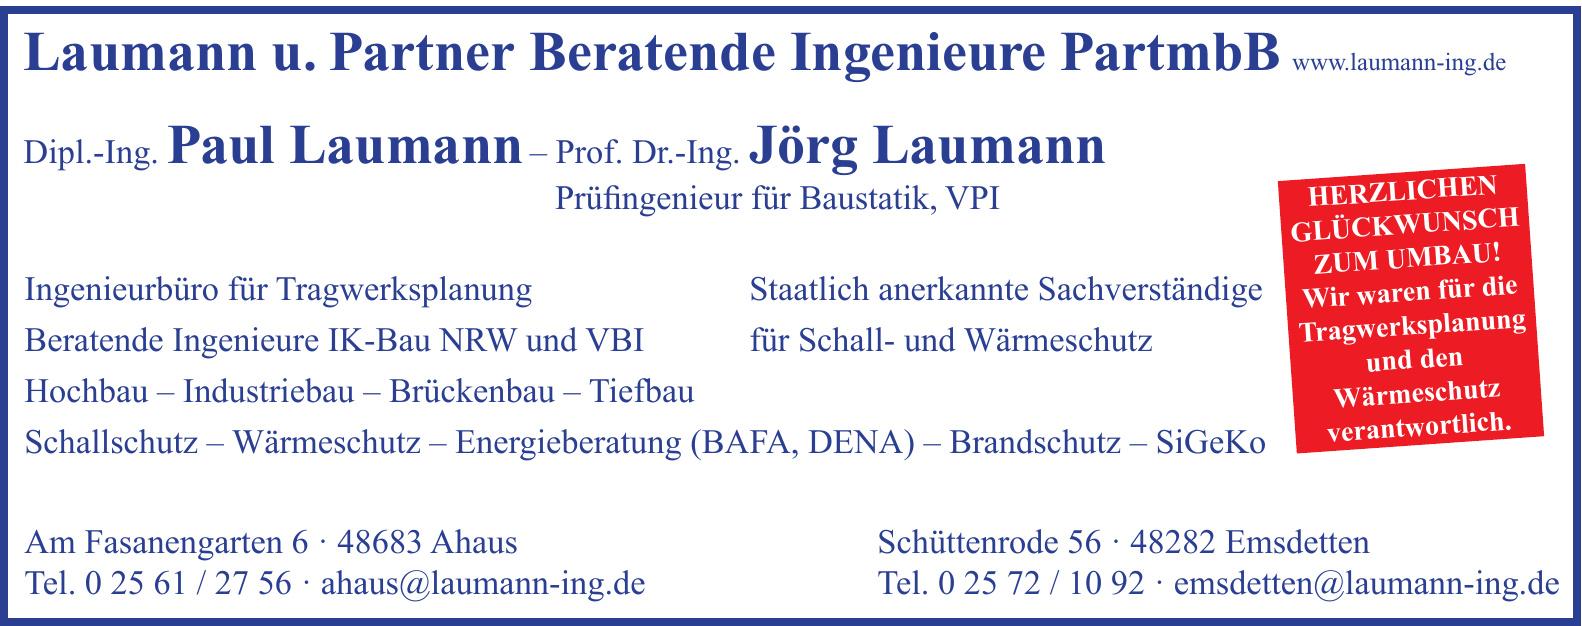 Laumann u. Partner Beratende Ingenieure PartmbB